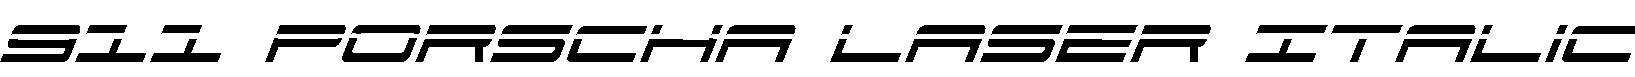 911-Porscha-Laser-Italic